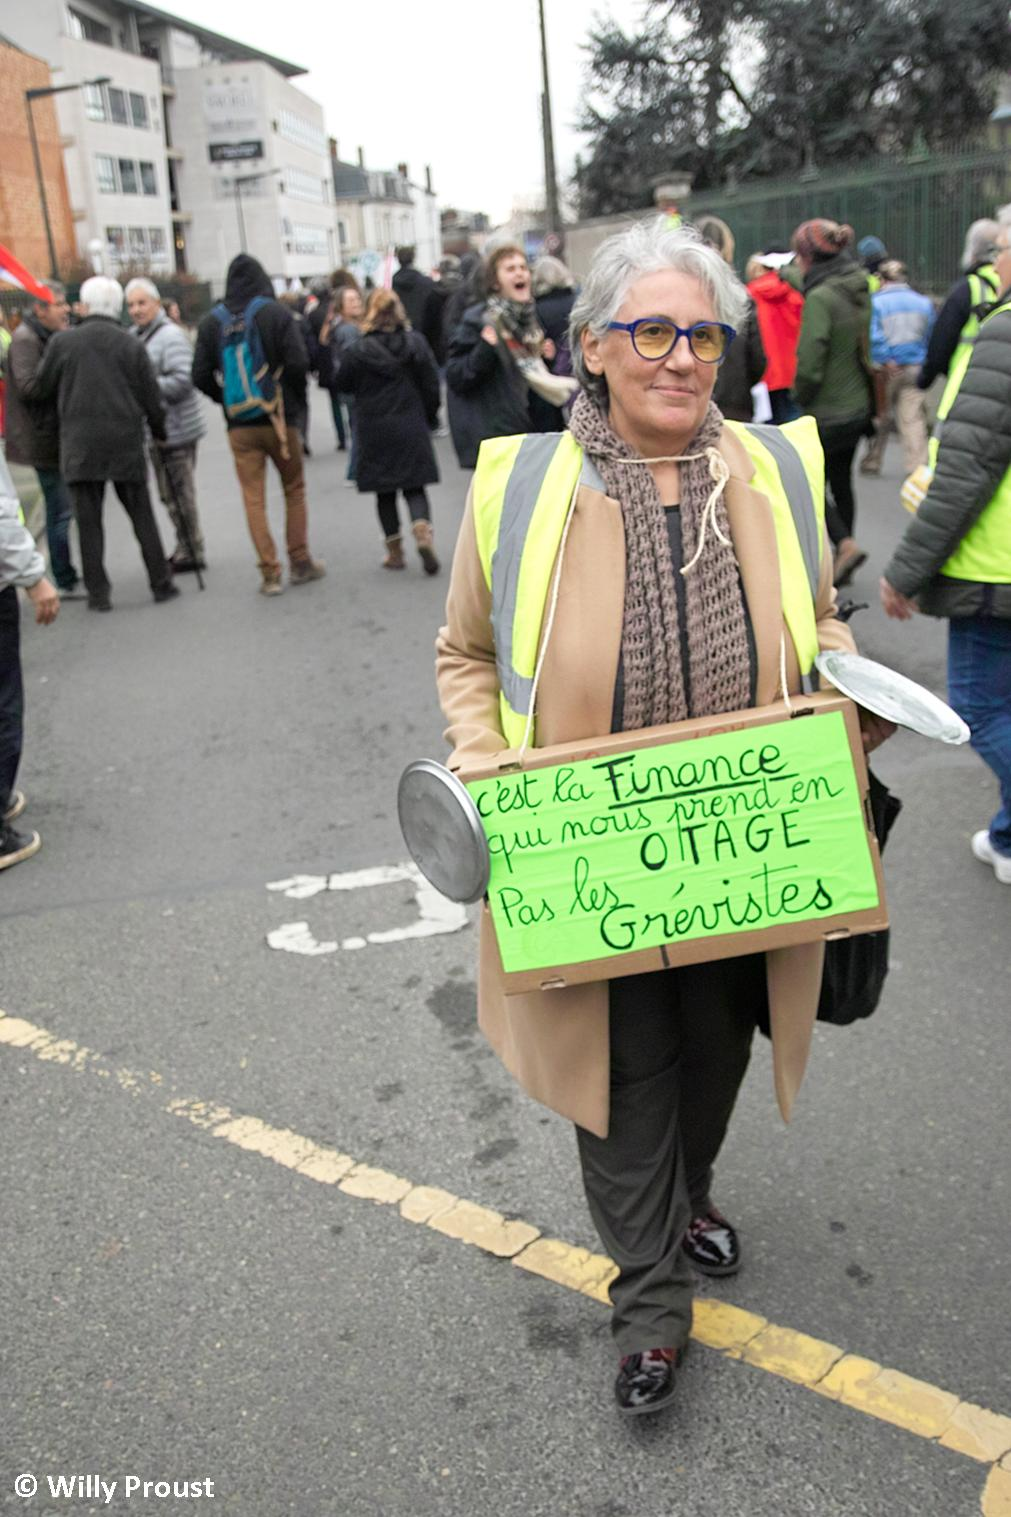 Chartres 17-12-2019 Manifestation Retraites [Photo Willy Proust] 13